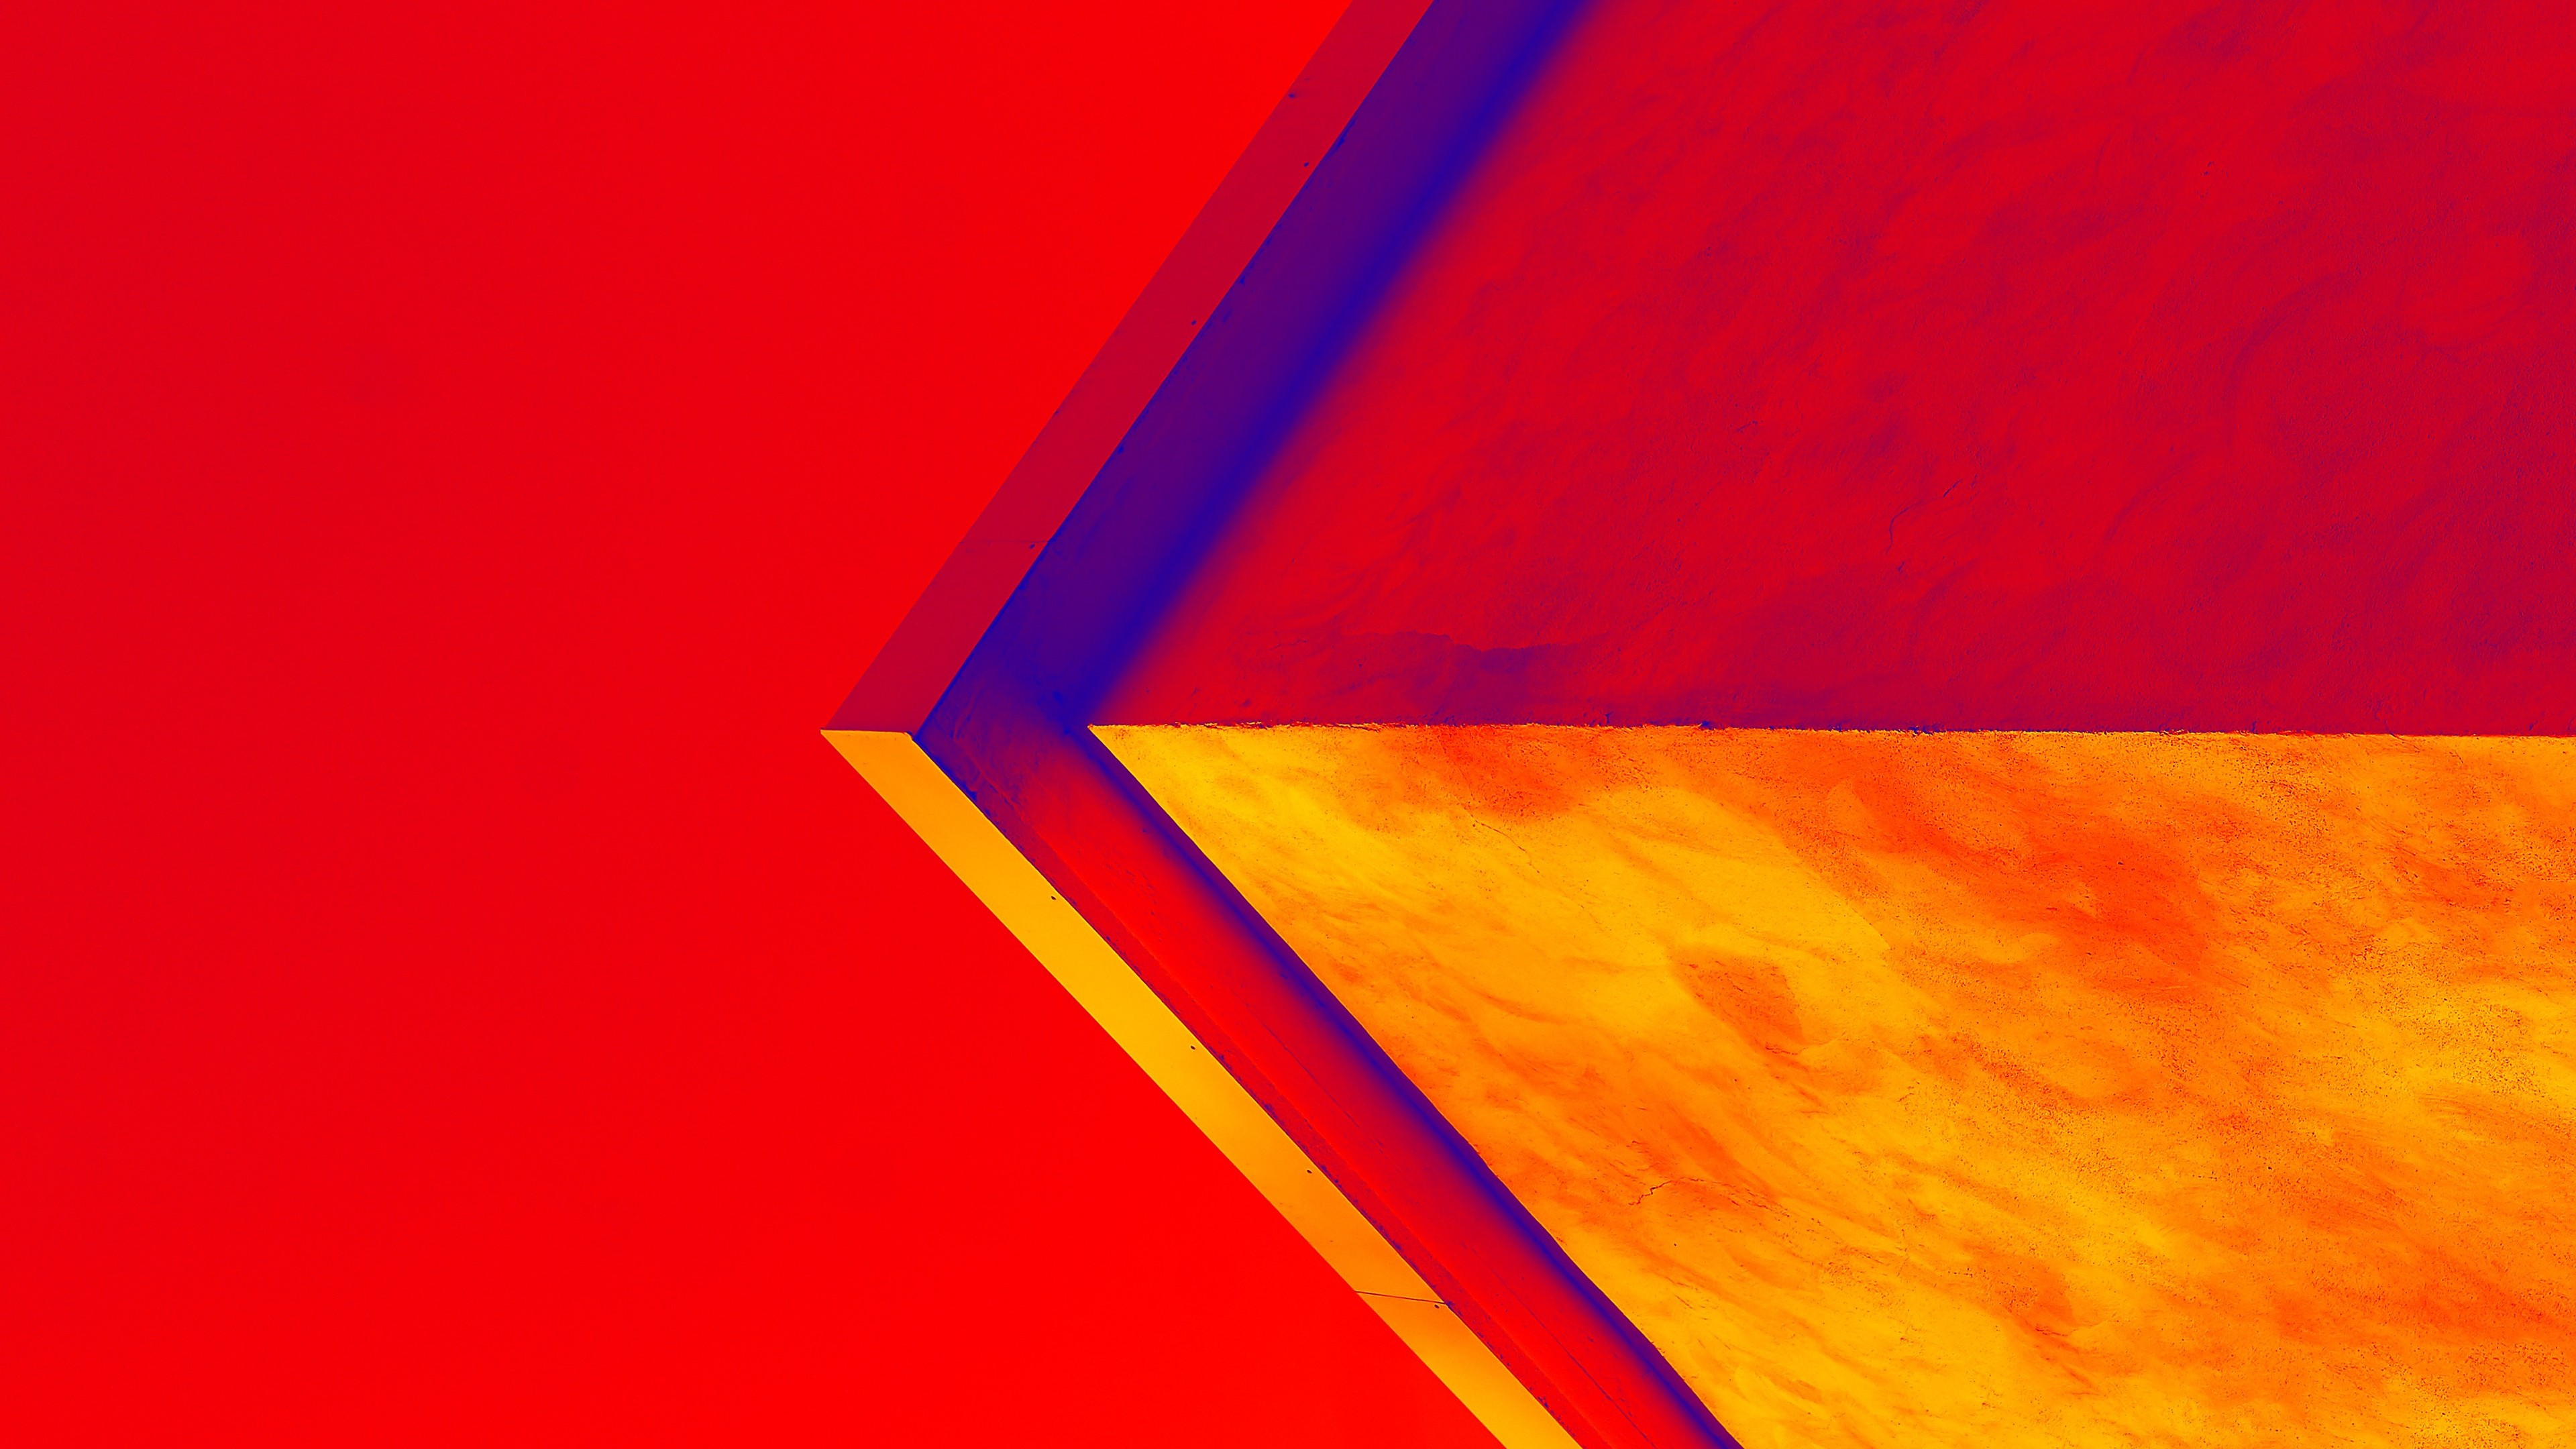 red arrows shapes art 4k 1540748527 - Red Arrows Shapes Art 4k - simple wallpapers, shapes wallpapers, red wallpapers, digital art wallpapers, artist wallpapers, art wallpapers